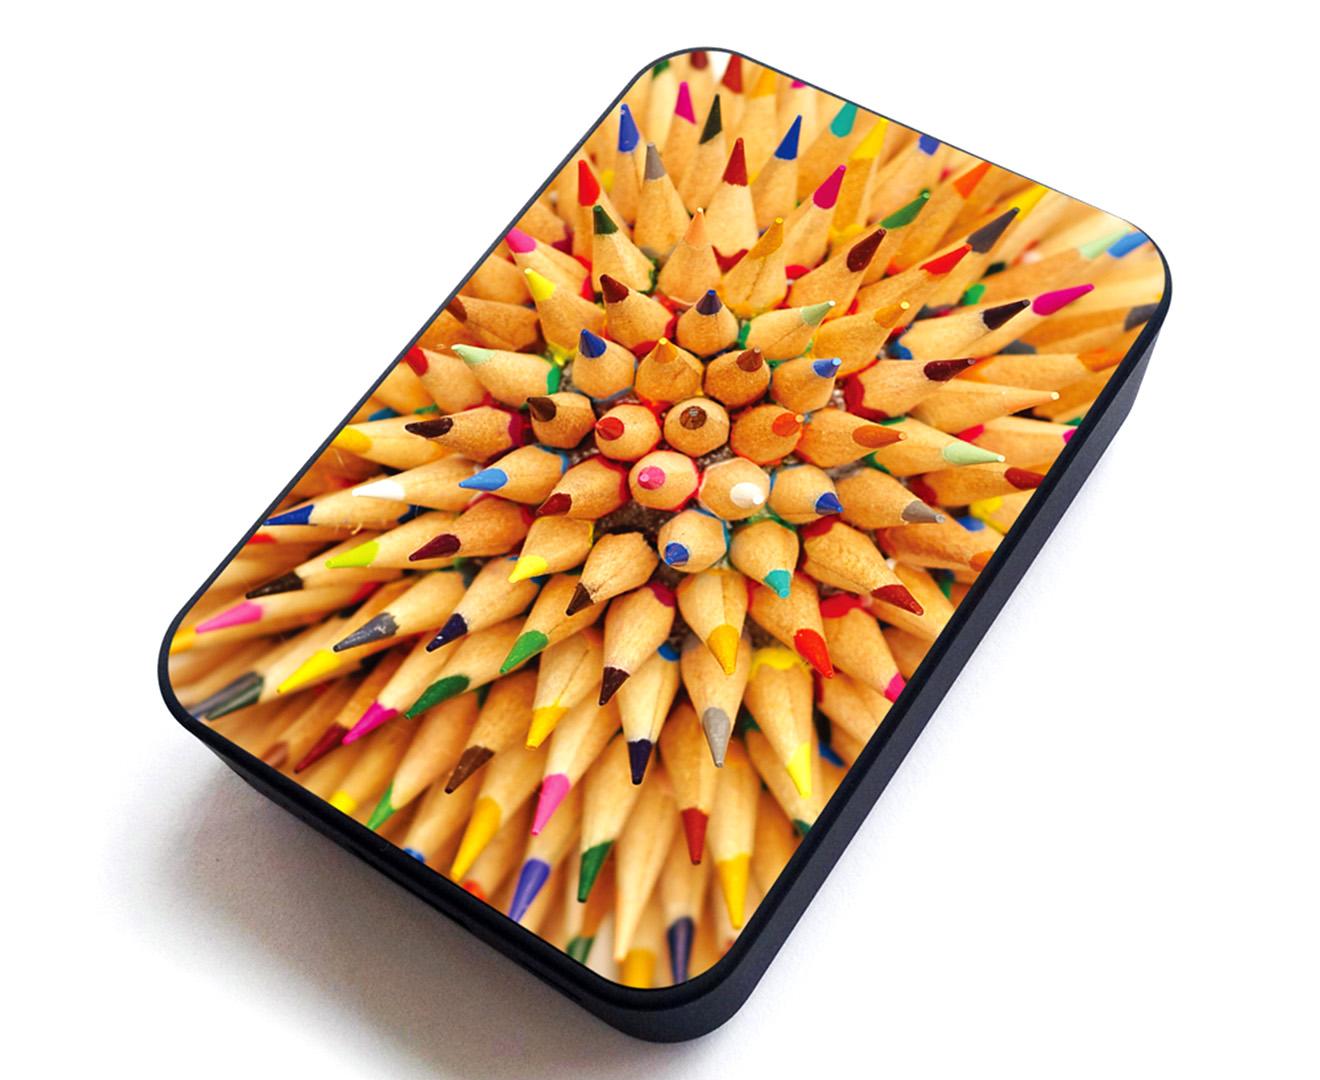 Smartoools Mc10 10000mah Mobile Charger Pencils Great